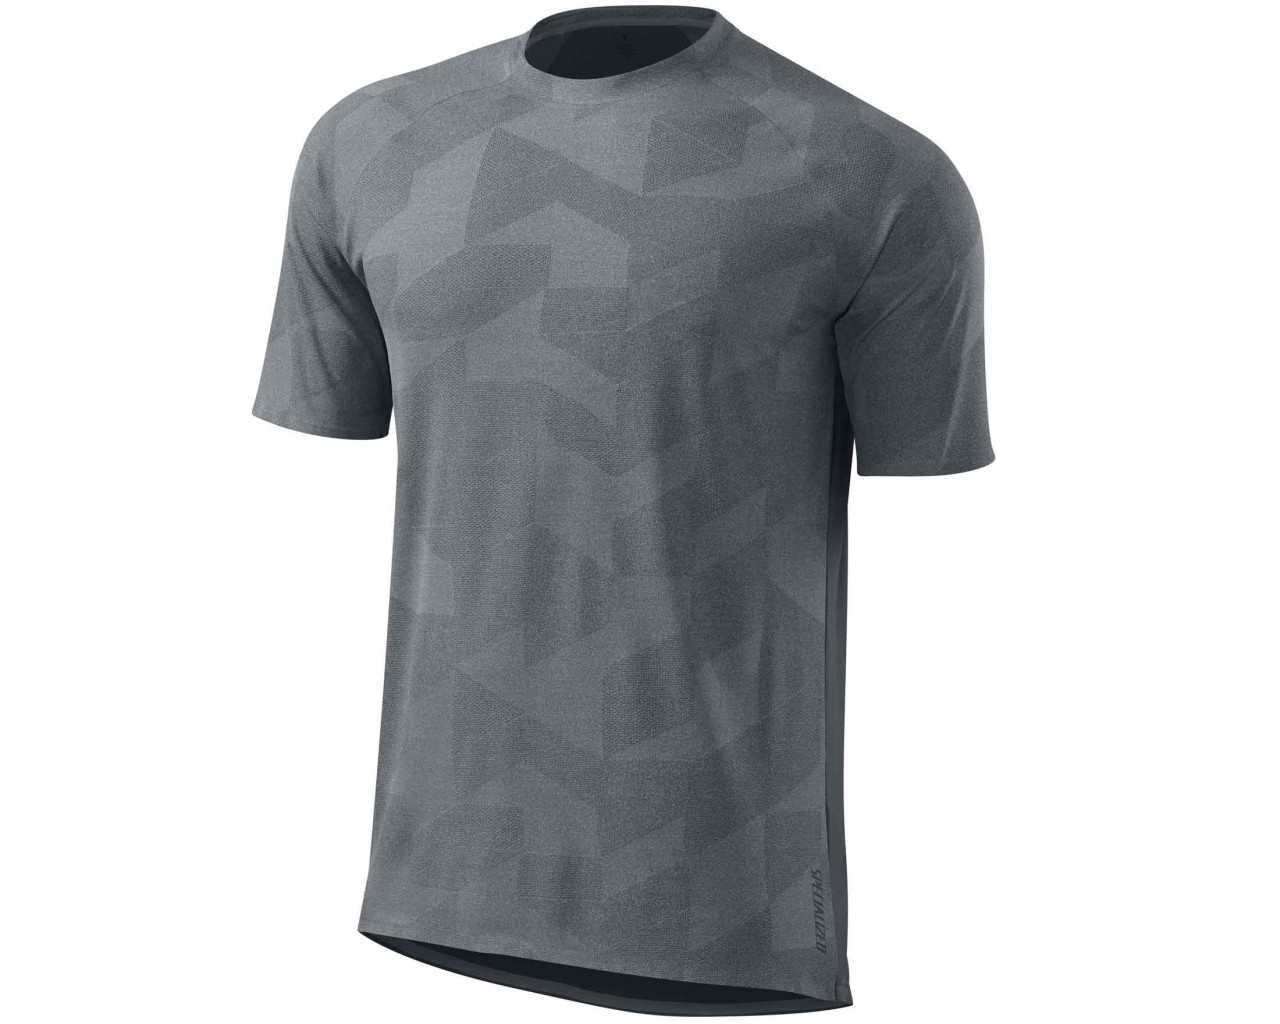 Specialized Atlas Pro short sleeve jersey   carbon